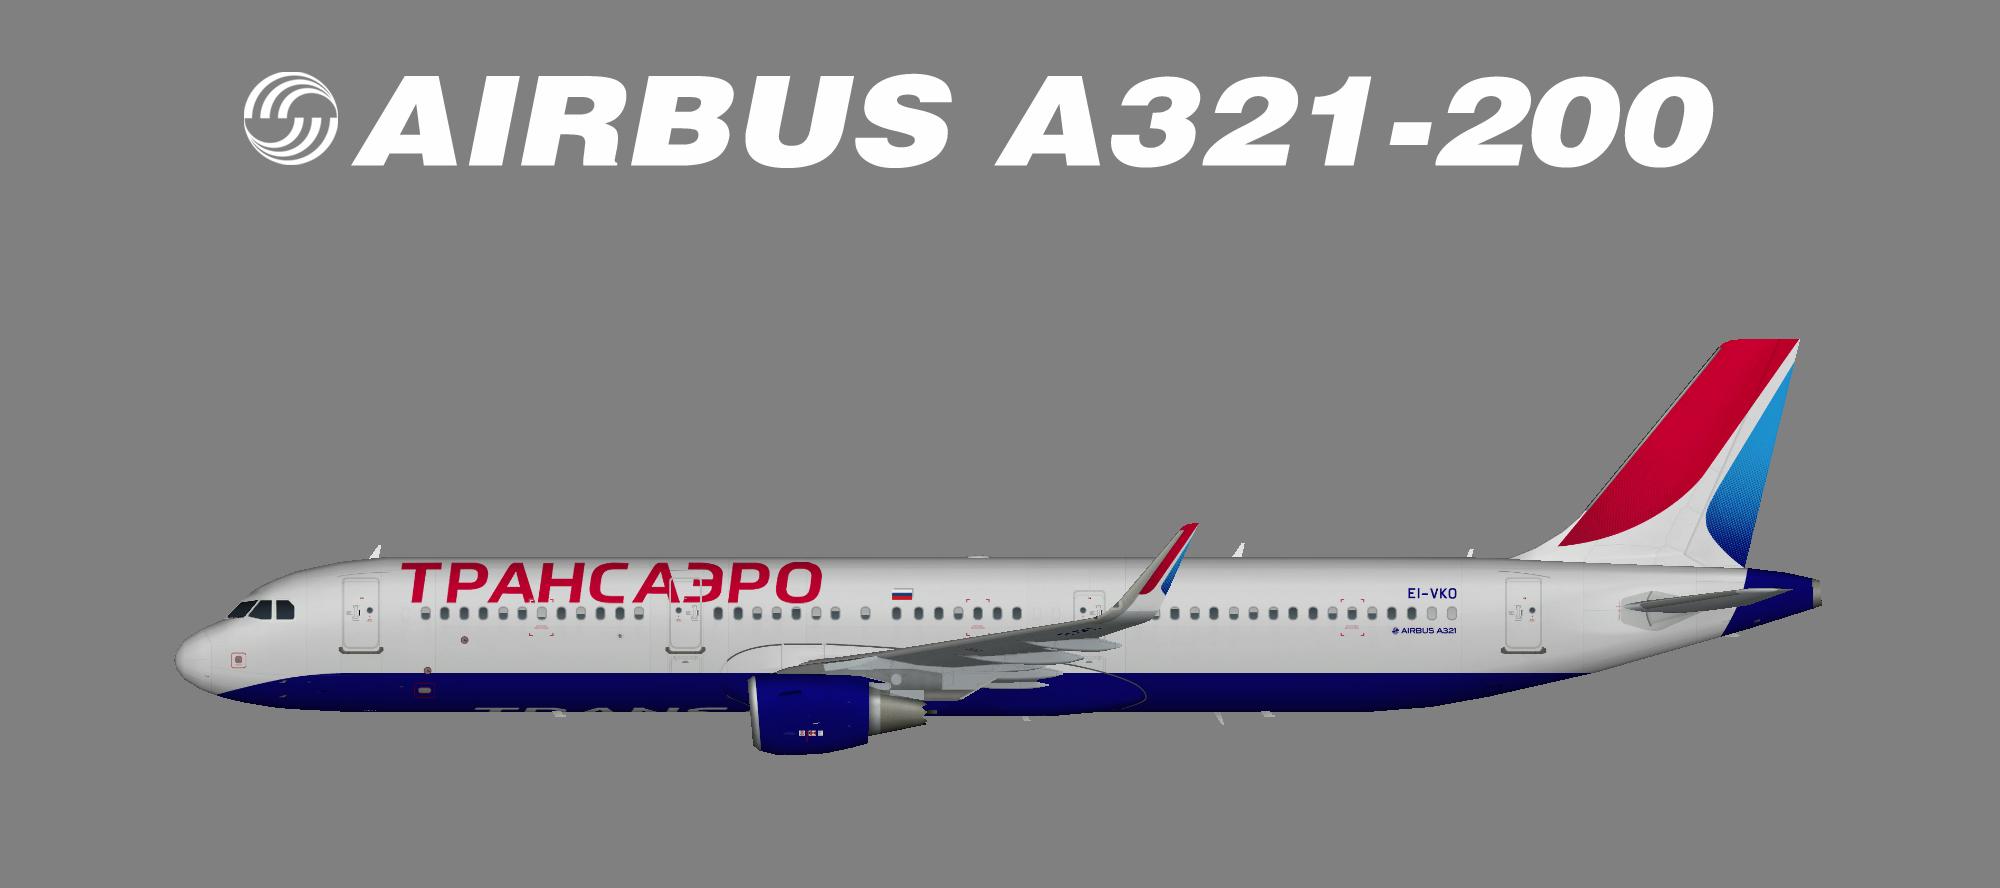 Transaero A321-200